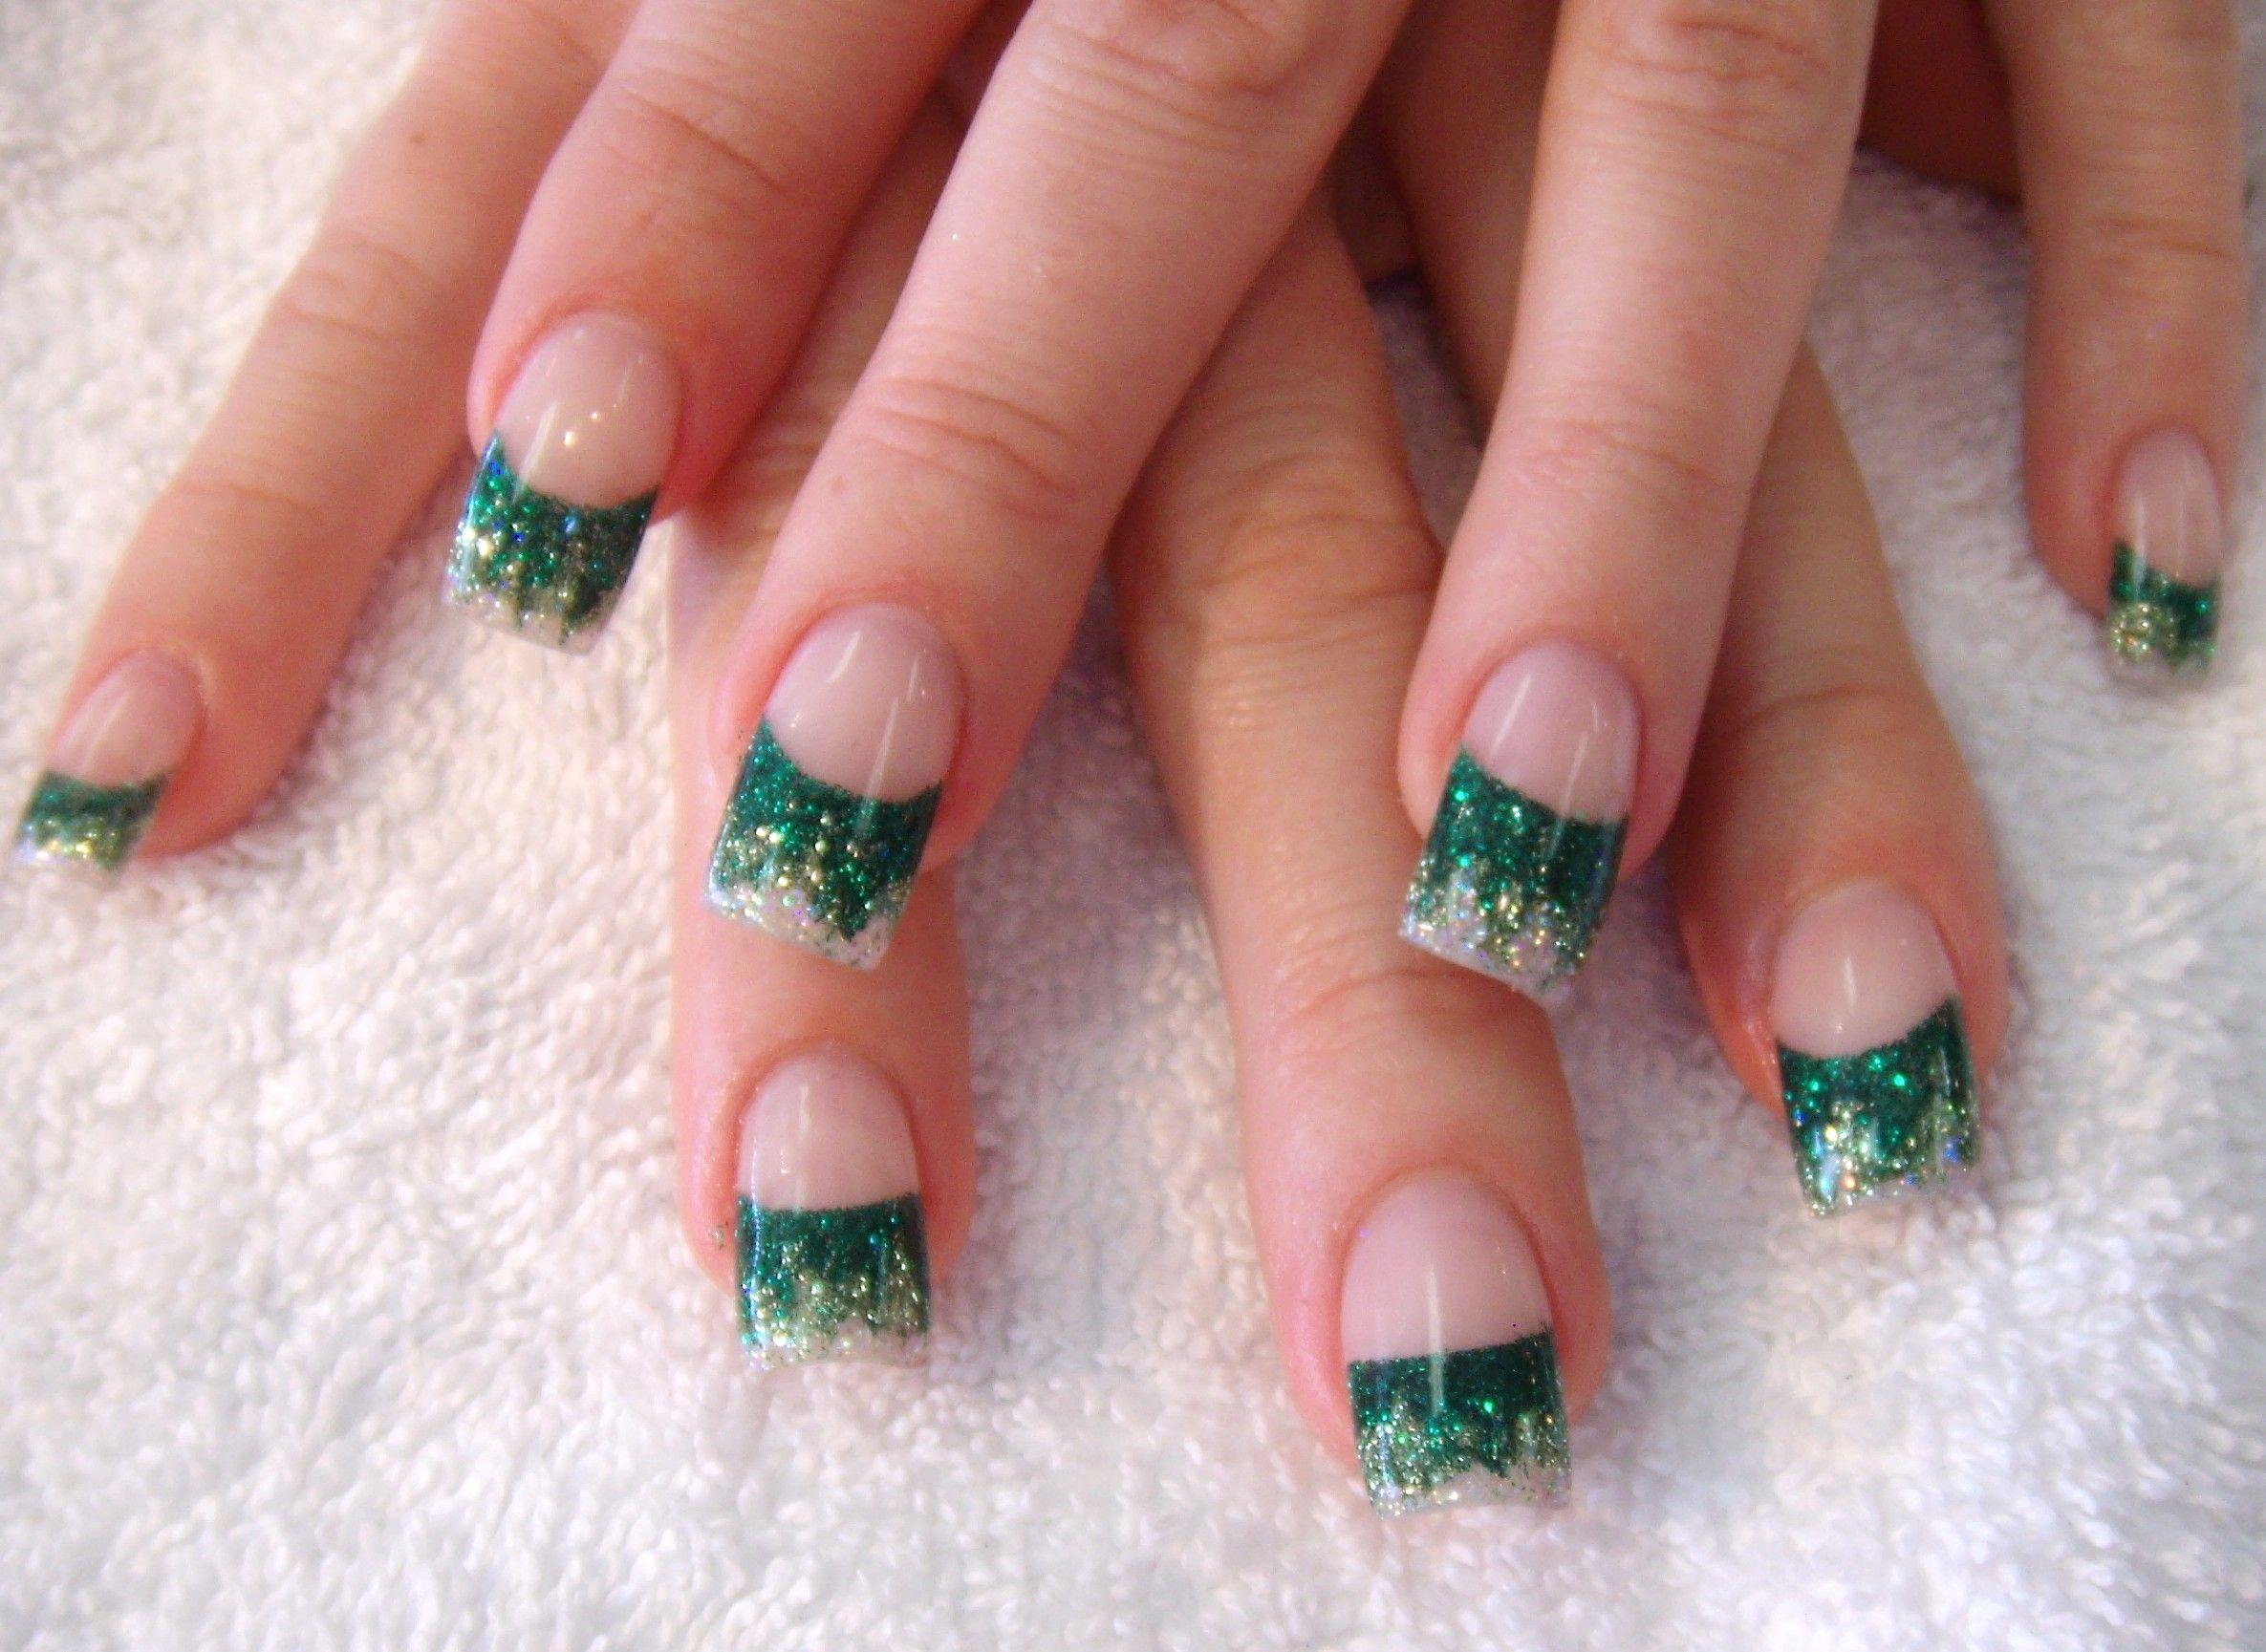 Elegant nail art tips and tricks nail art design gallery green elegant nail art tips and tricks prinsesfo Gallery